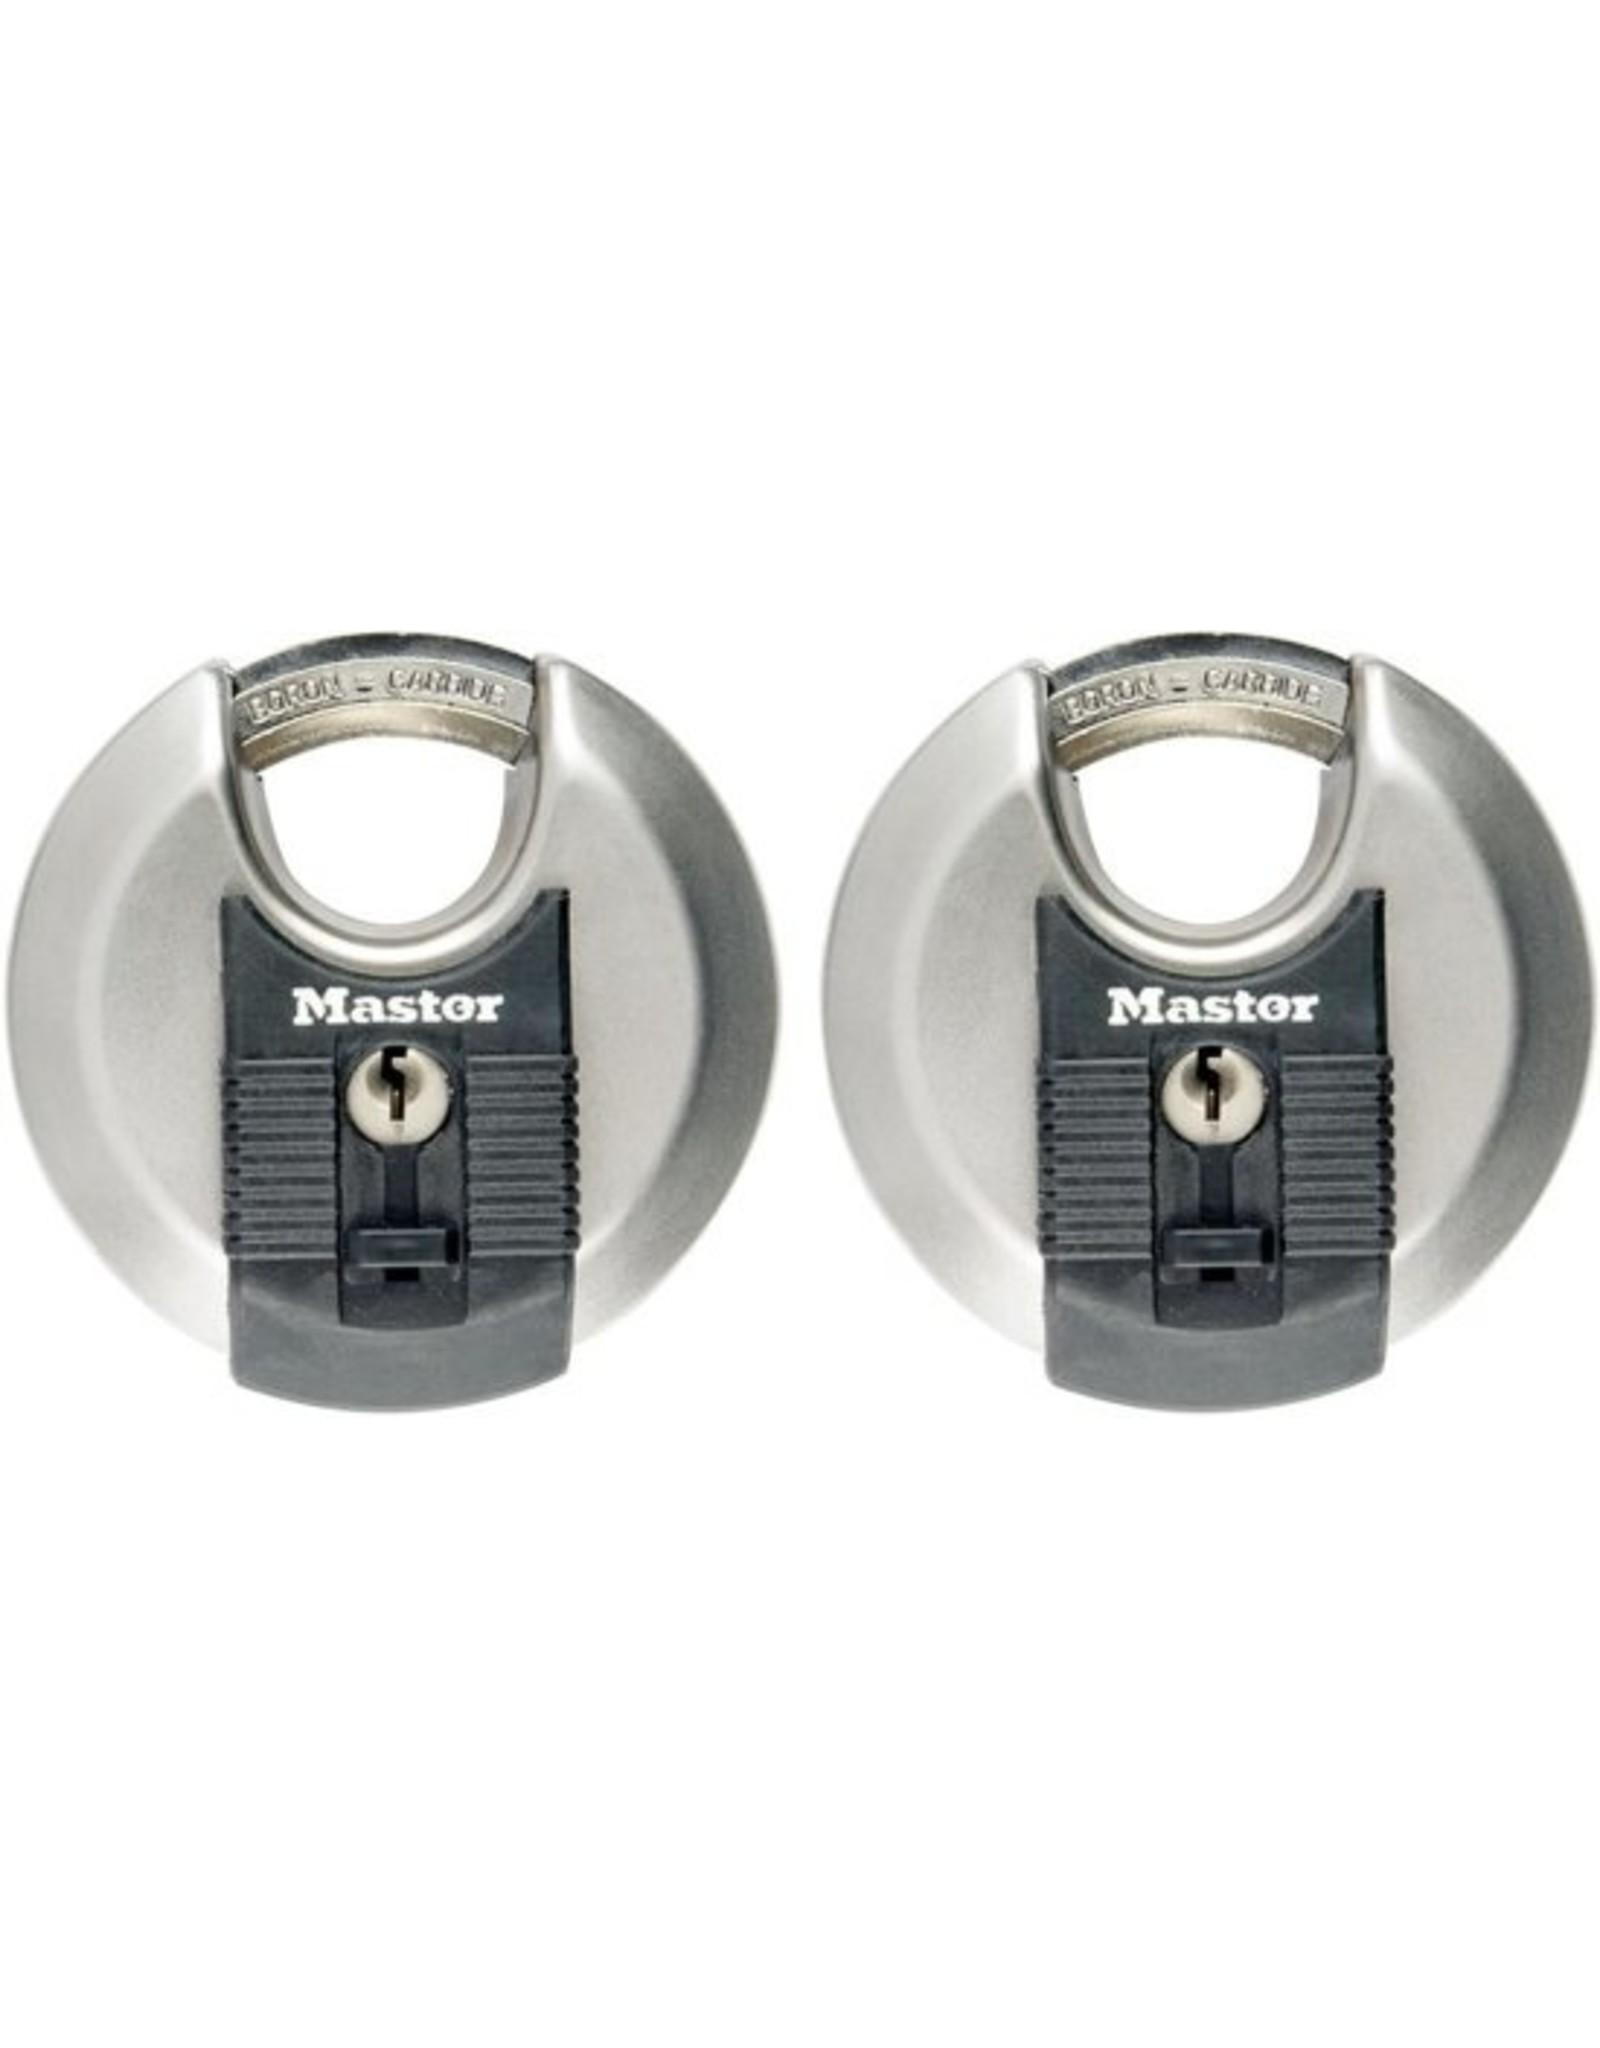 MasterLock MasterLock Excell® - Discusslot - 2 stuks - 70mm